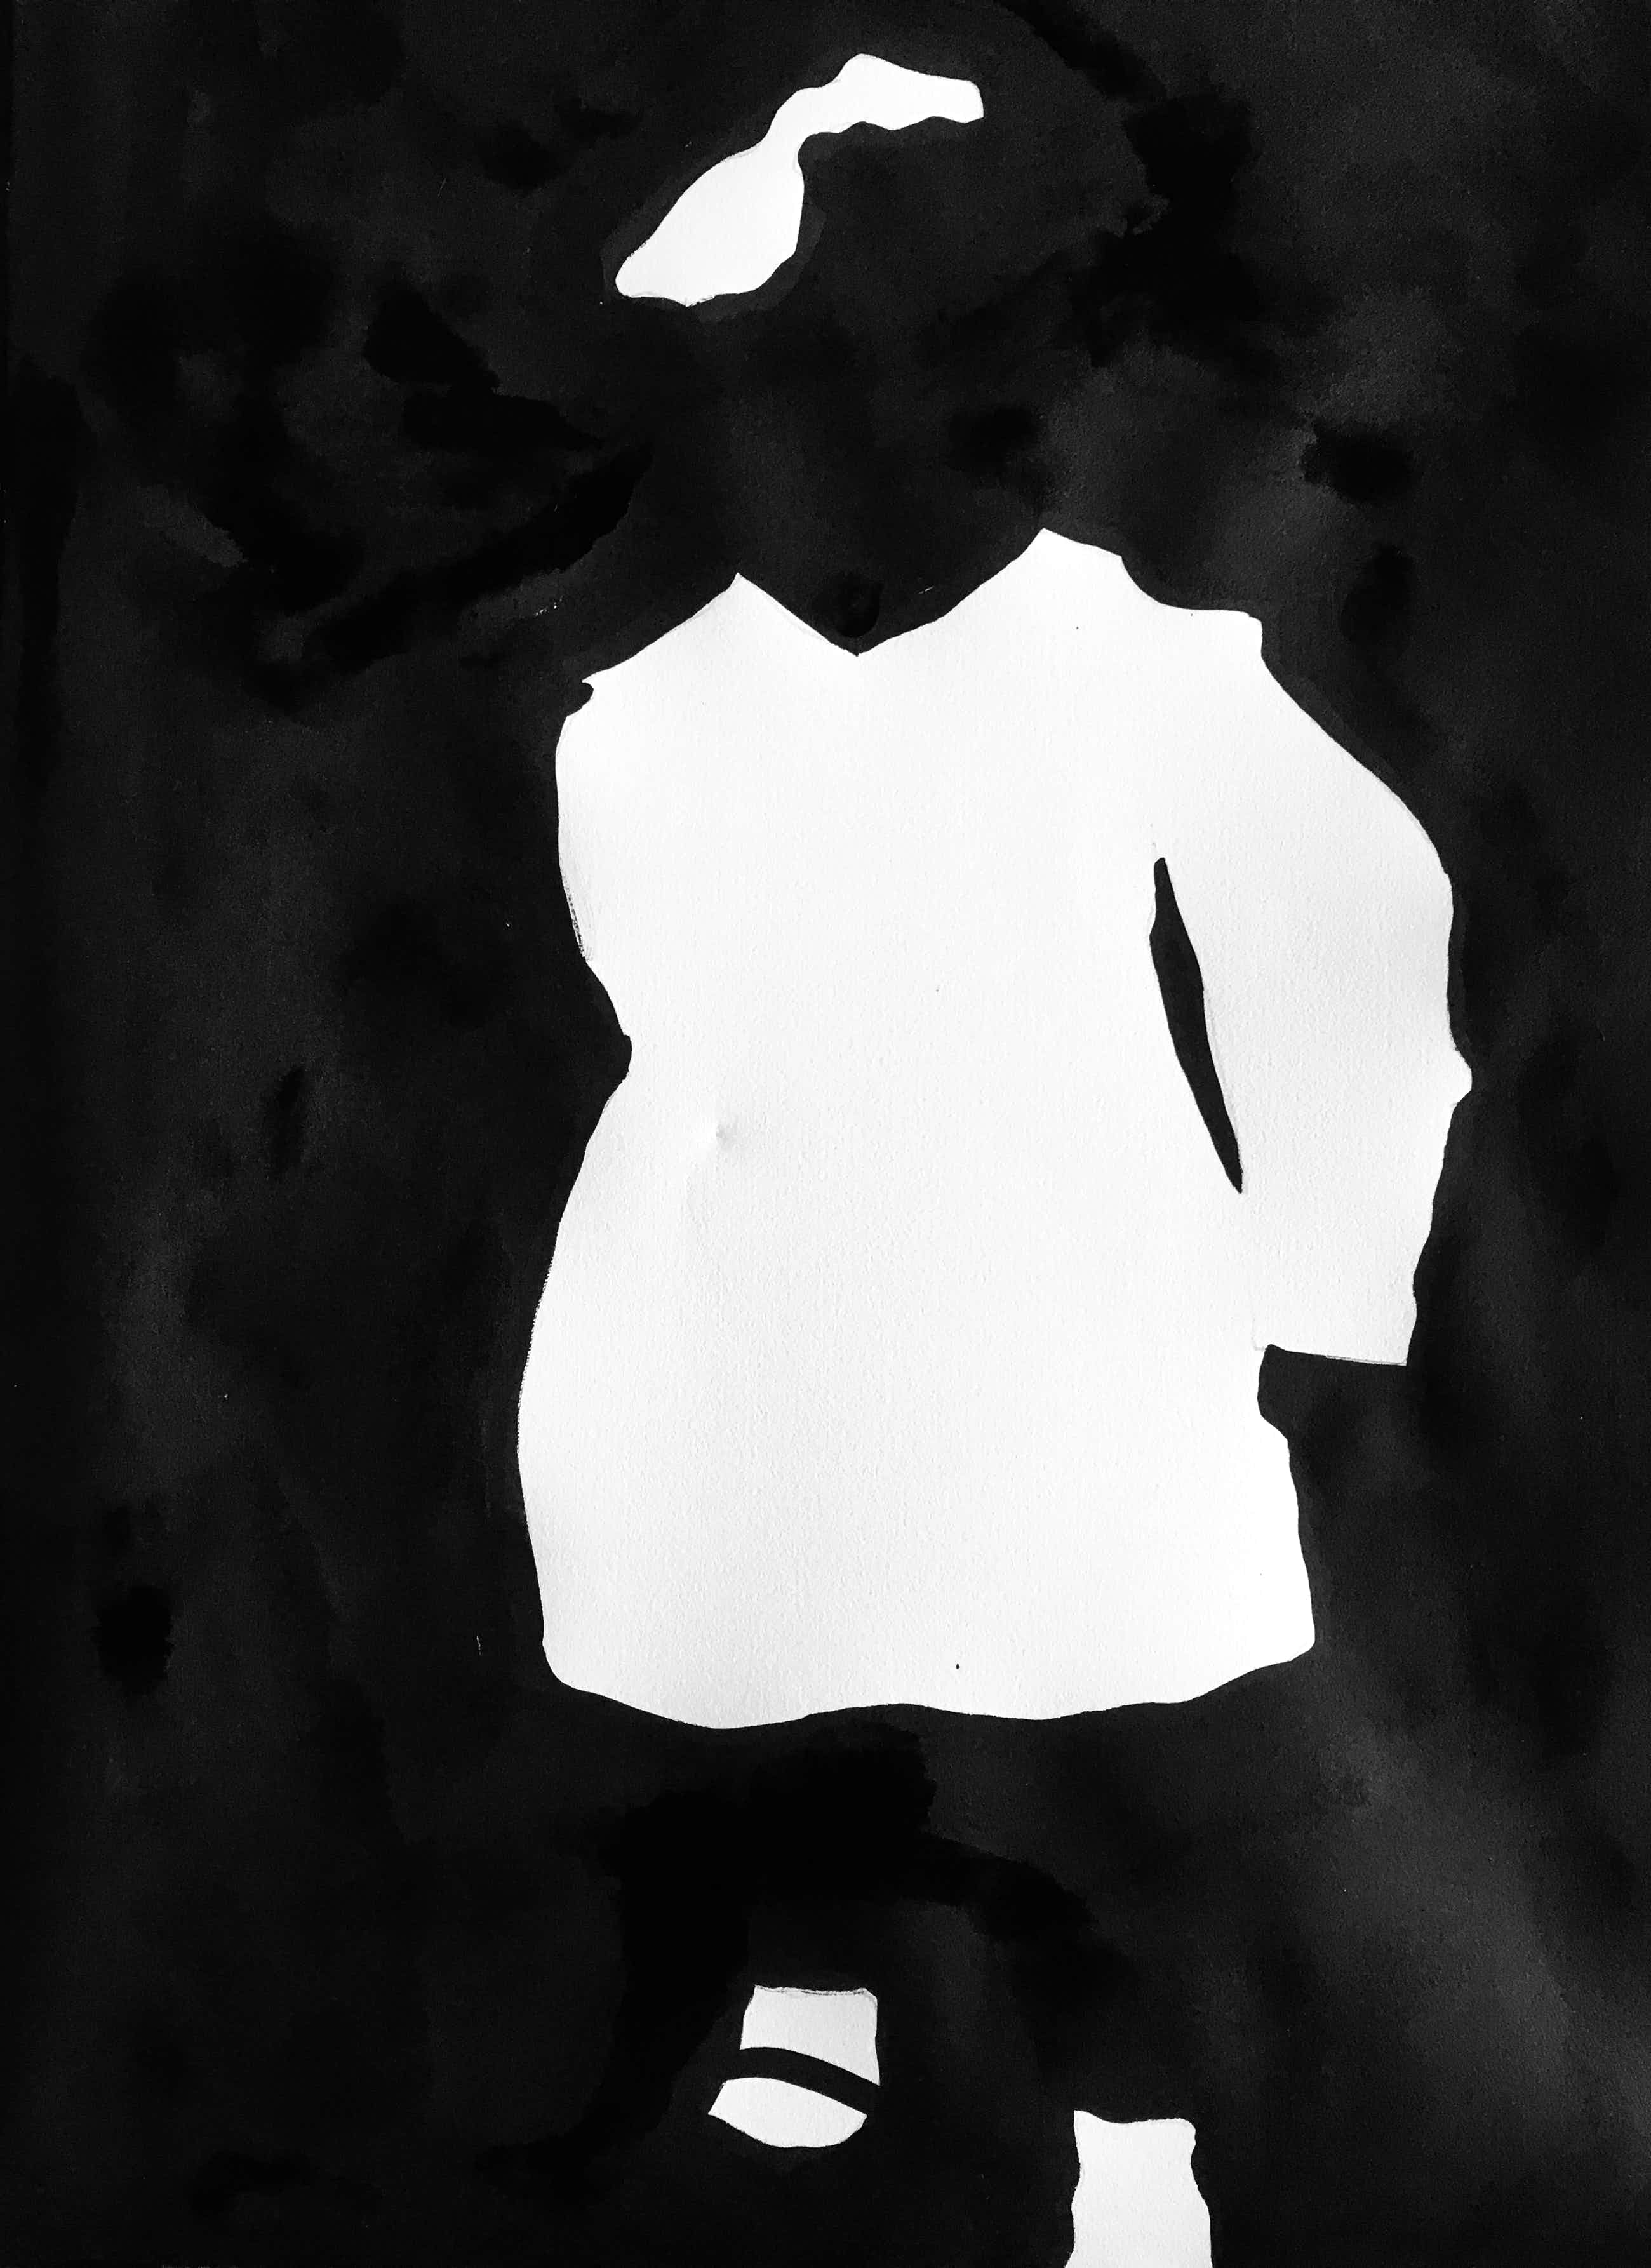 Rob Renoult - Braveheart, Made you look kopen? Bied vanaf 100!